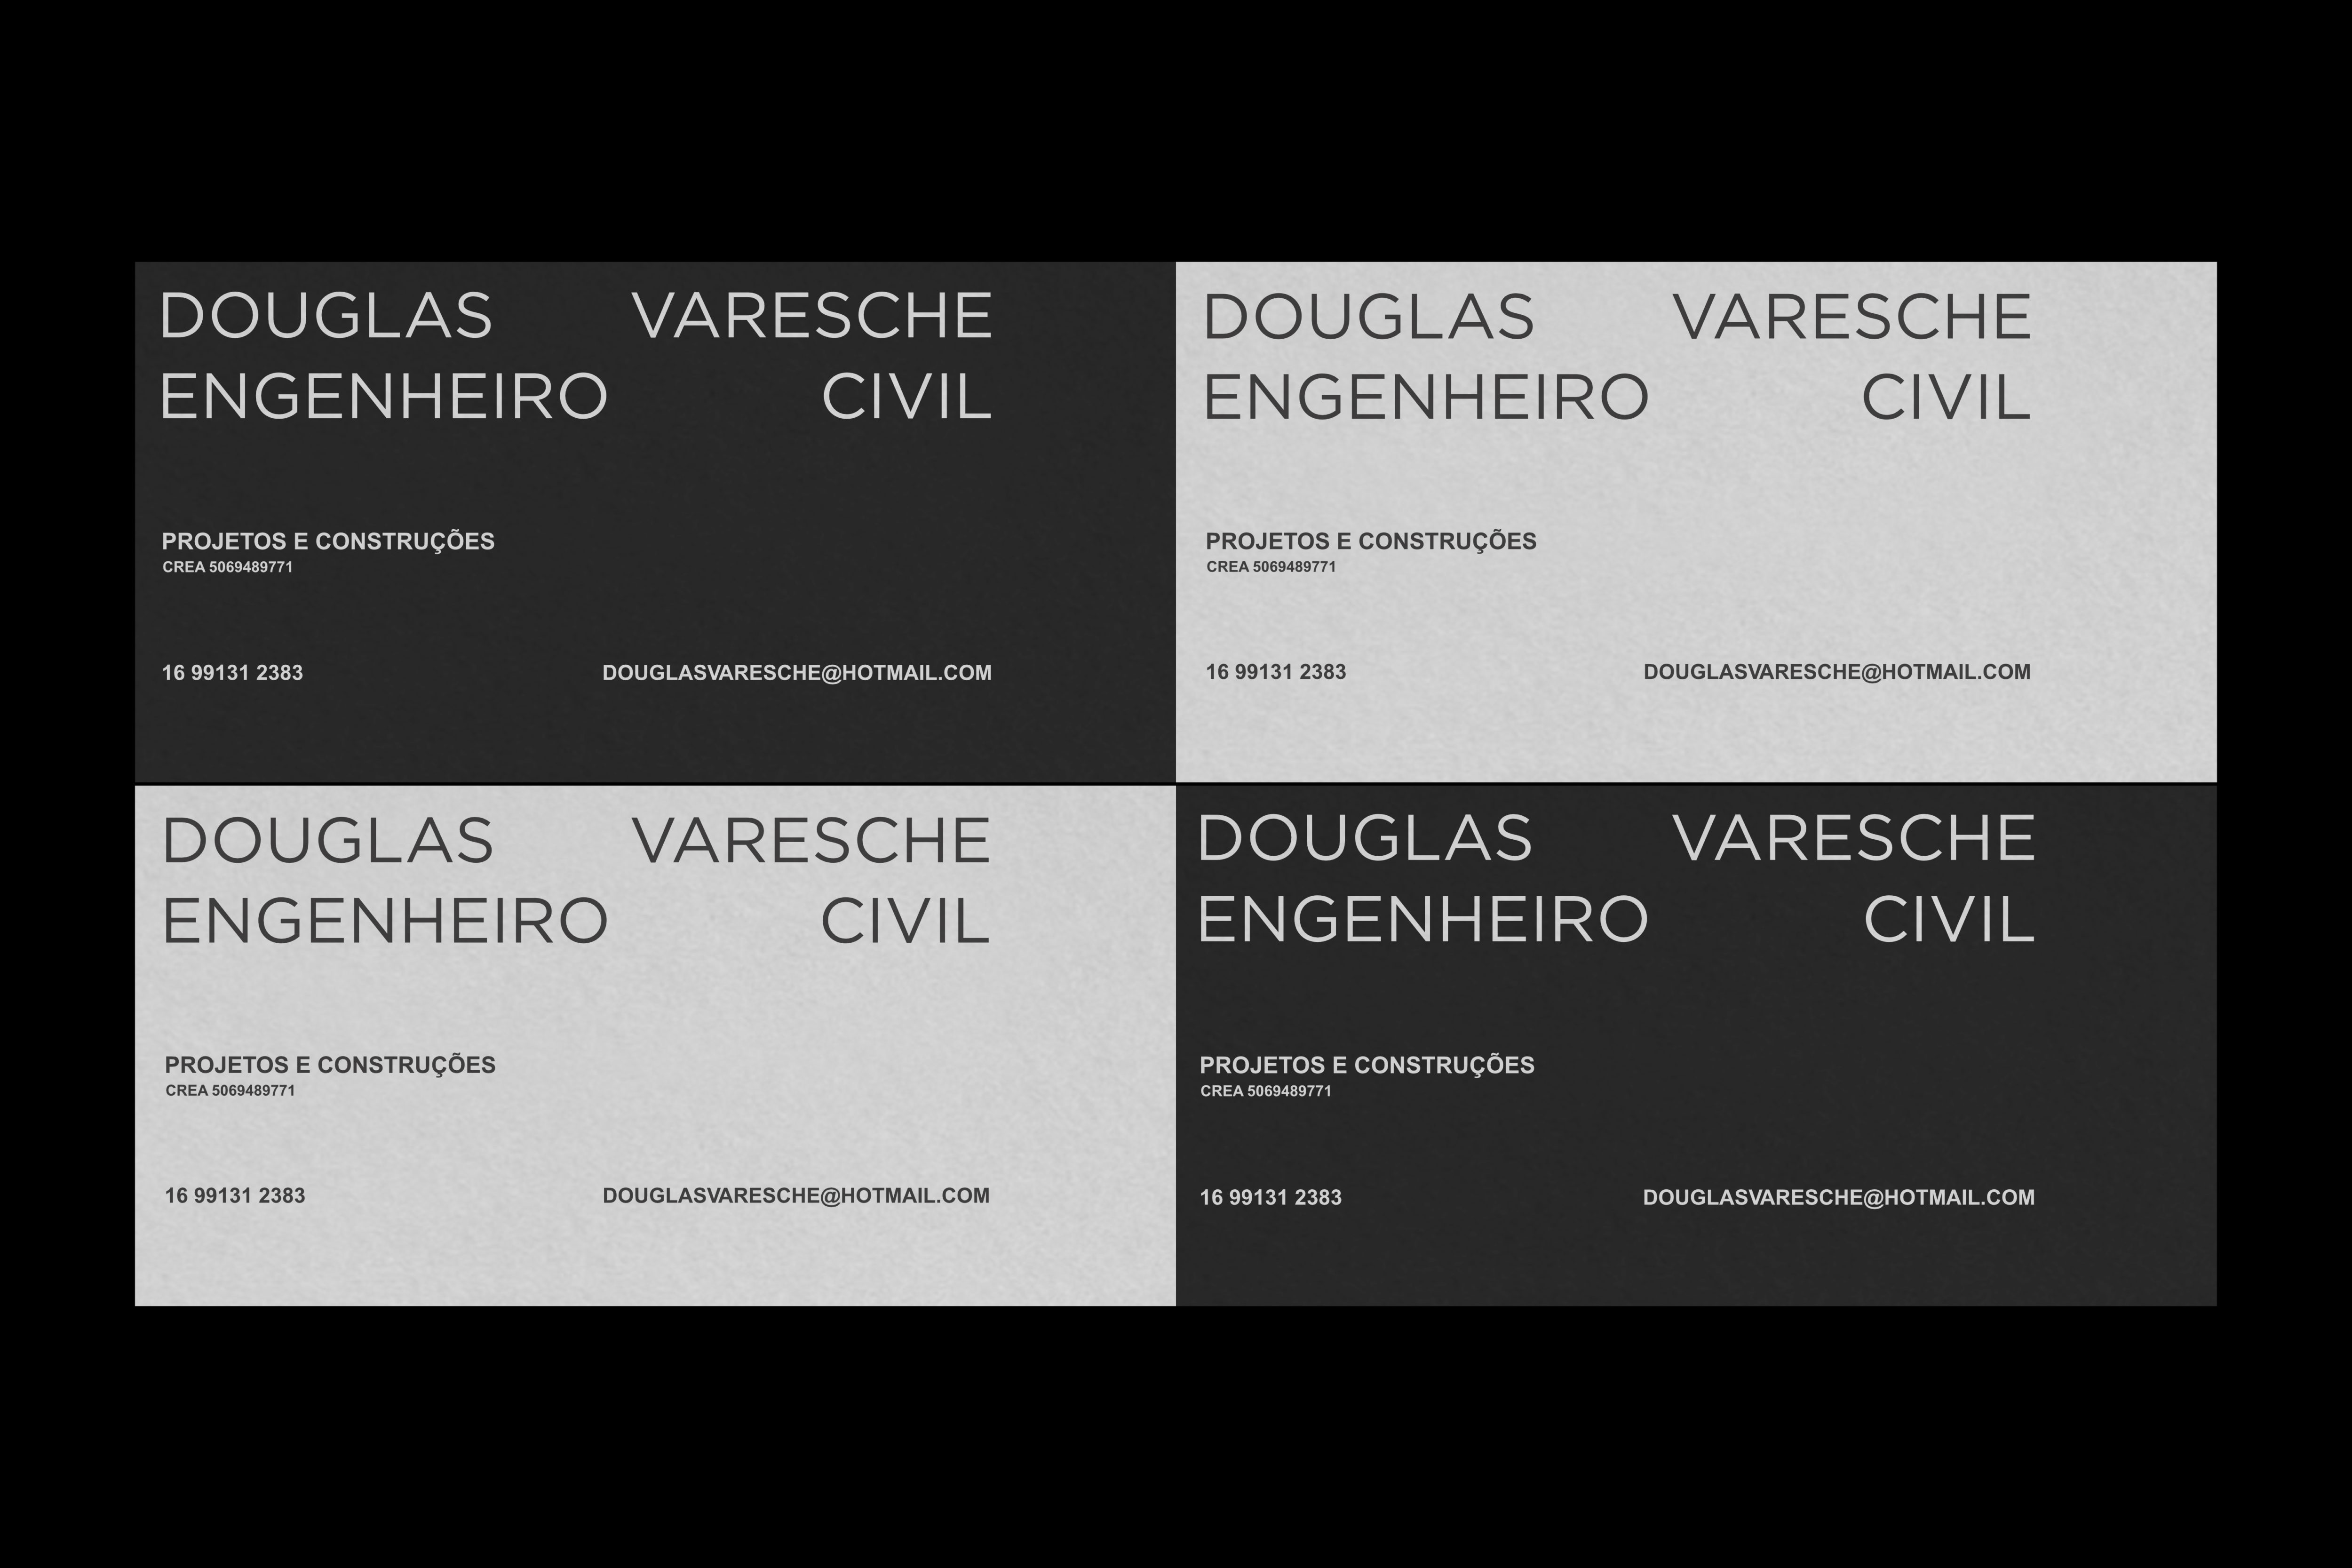 Douglas Varesche 8